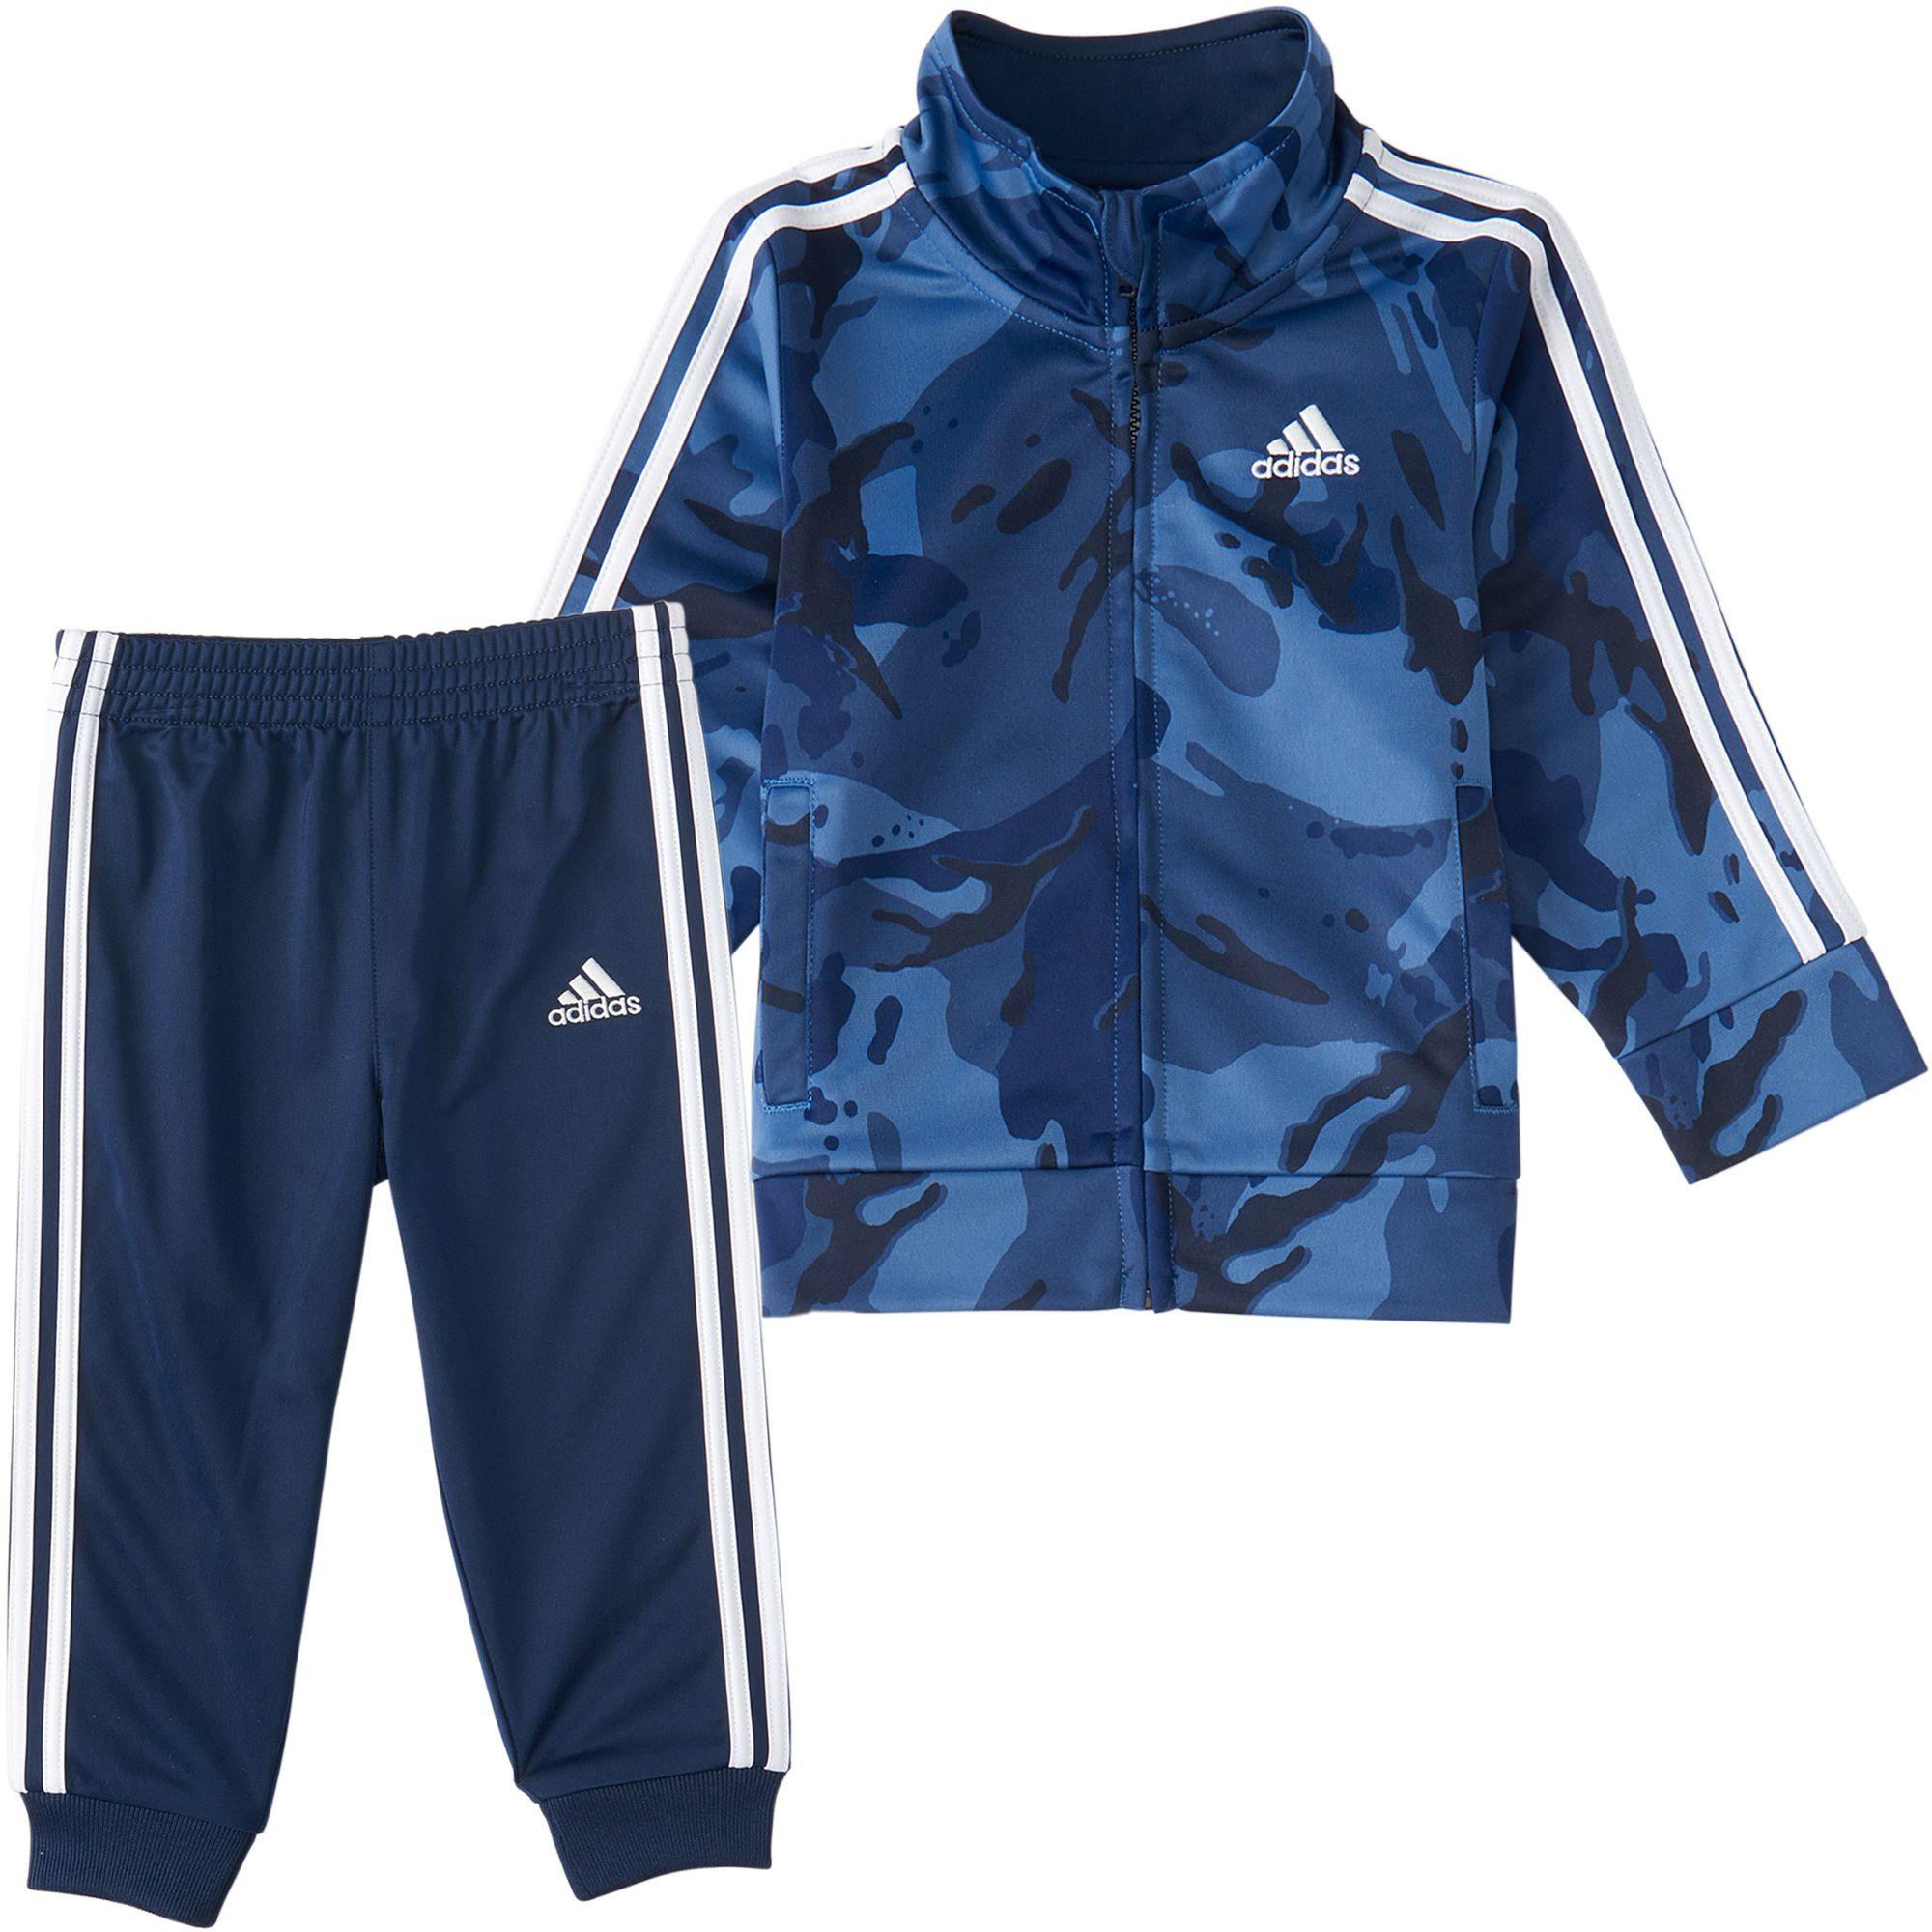 adidas Little Boys' Zip Front Classic Camo Jacket And Jogger Pants Set, Size 4, Blue thumbnail